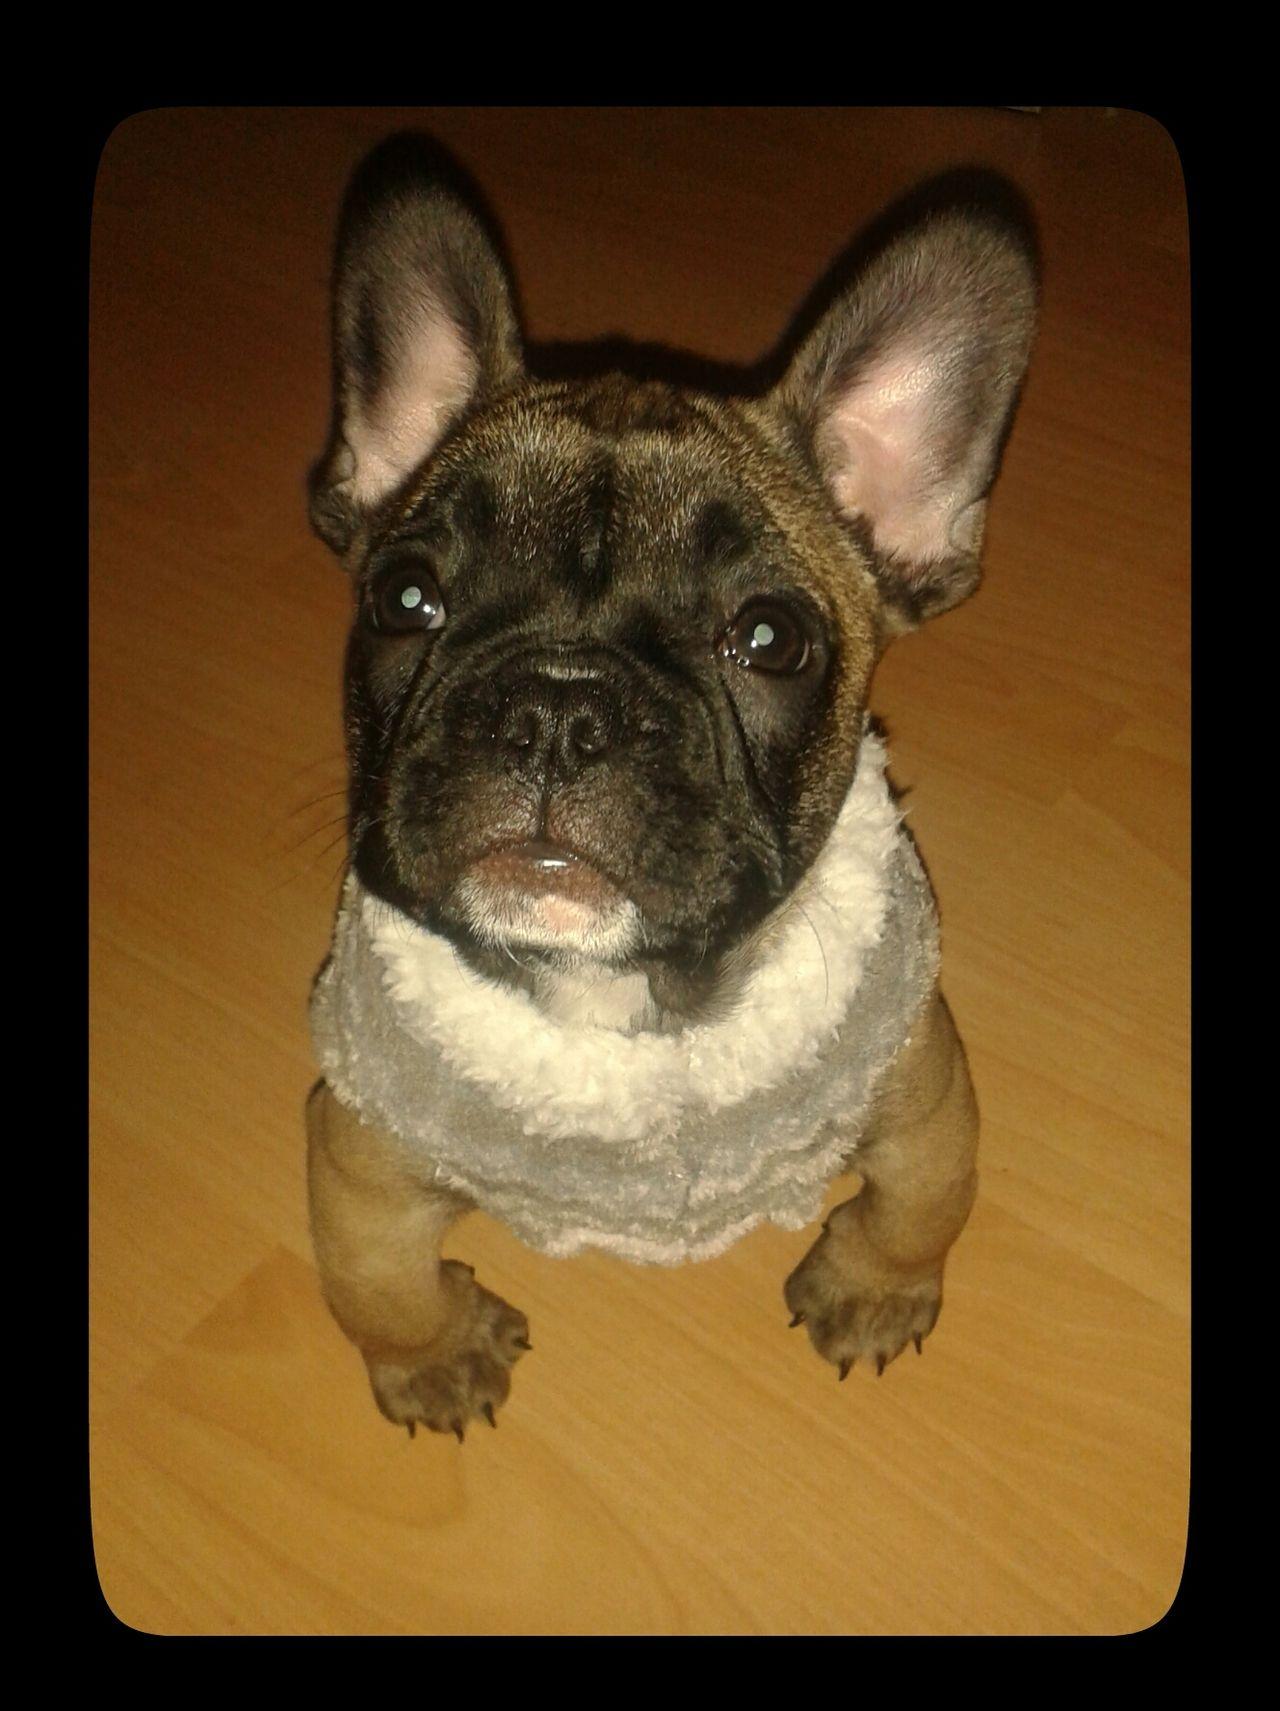 French Bulldog Puppy in a Lace Dress. Französische